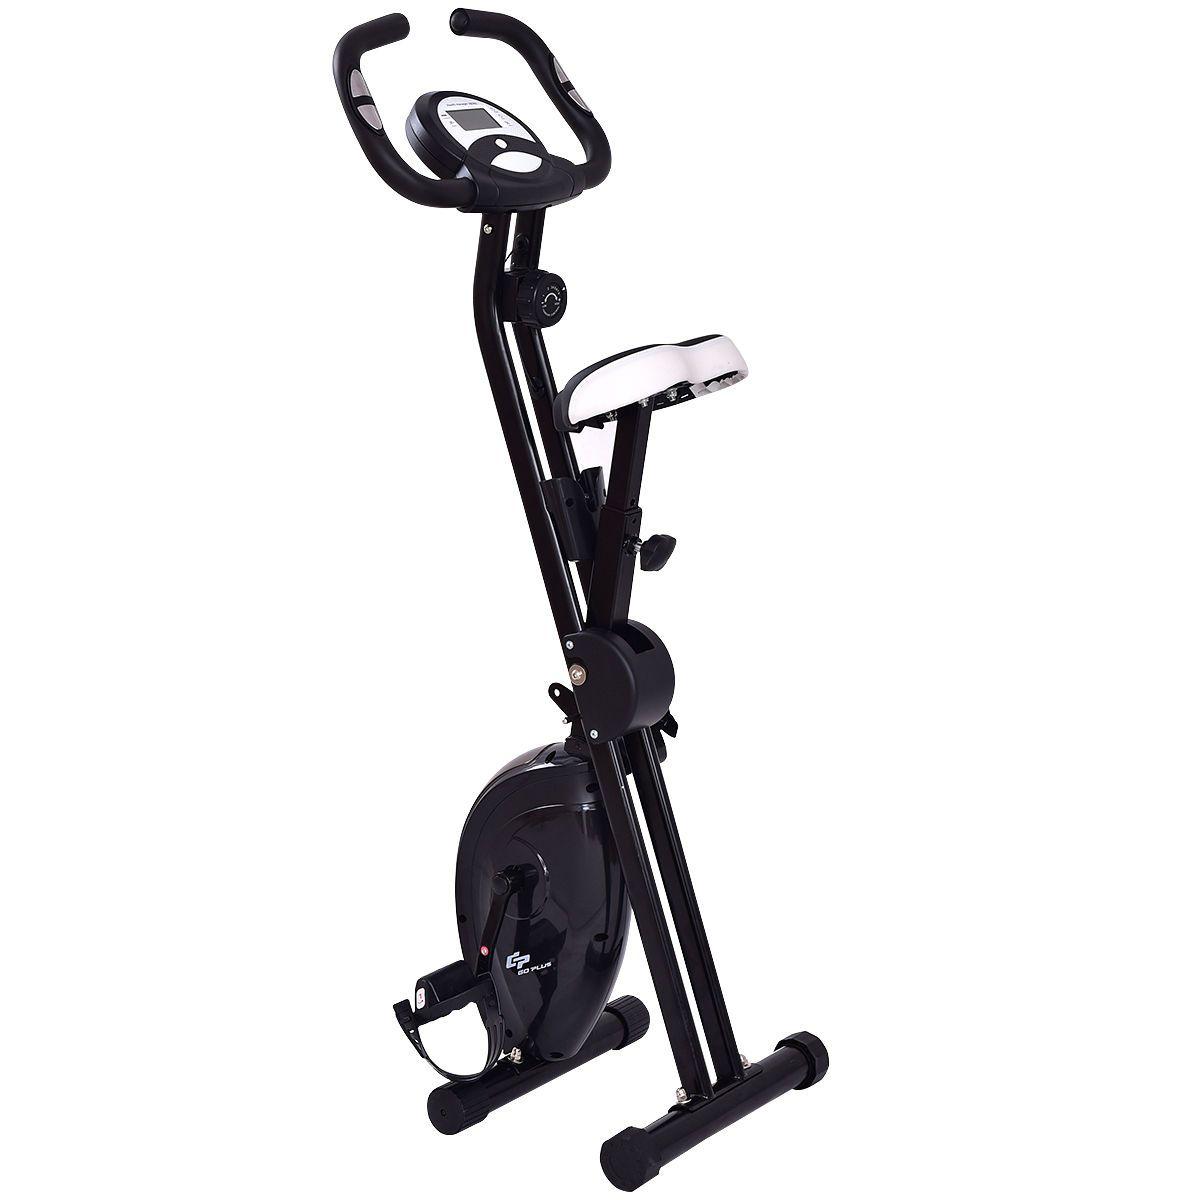 45 Height Resistance Adjustable Folding Magnetic Exercise Bike